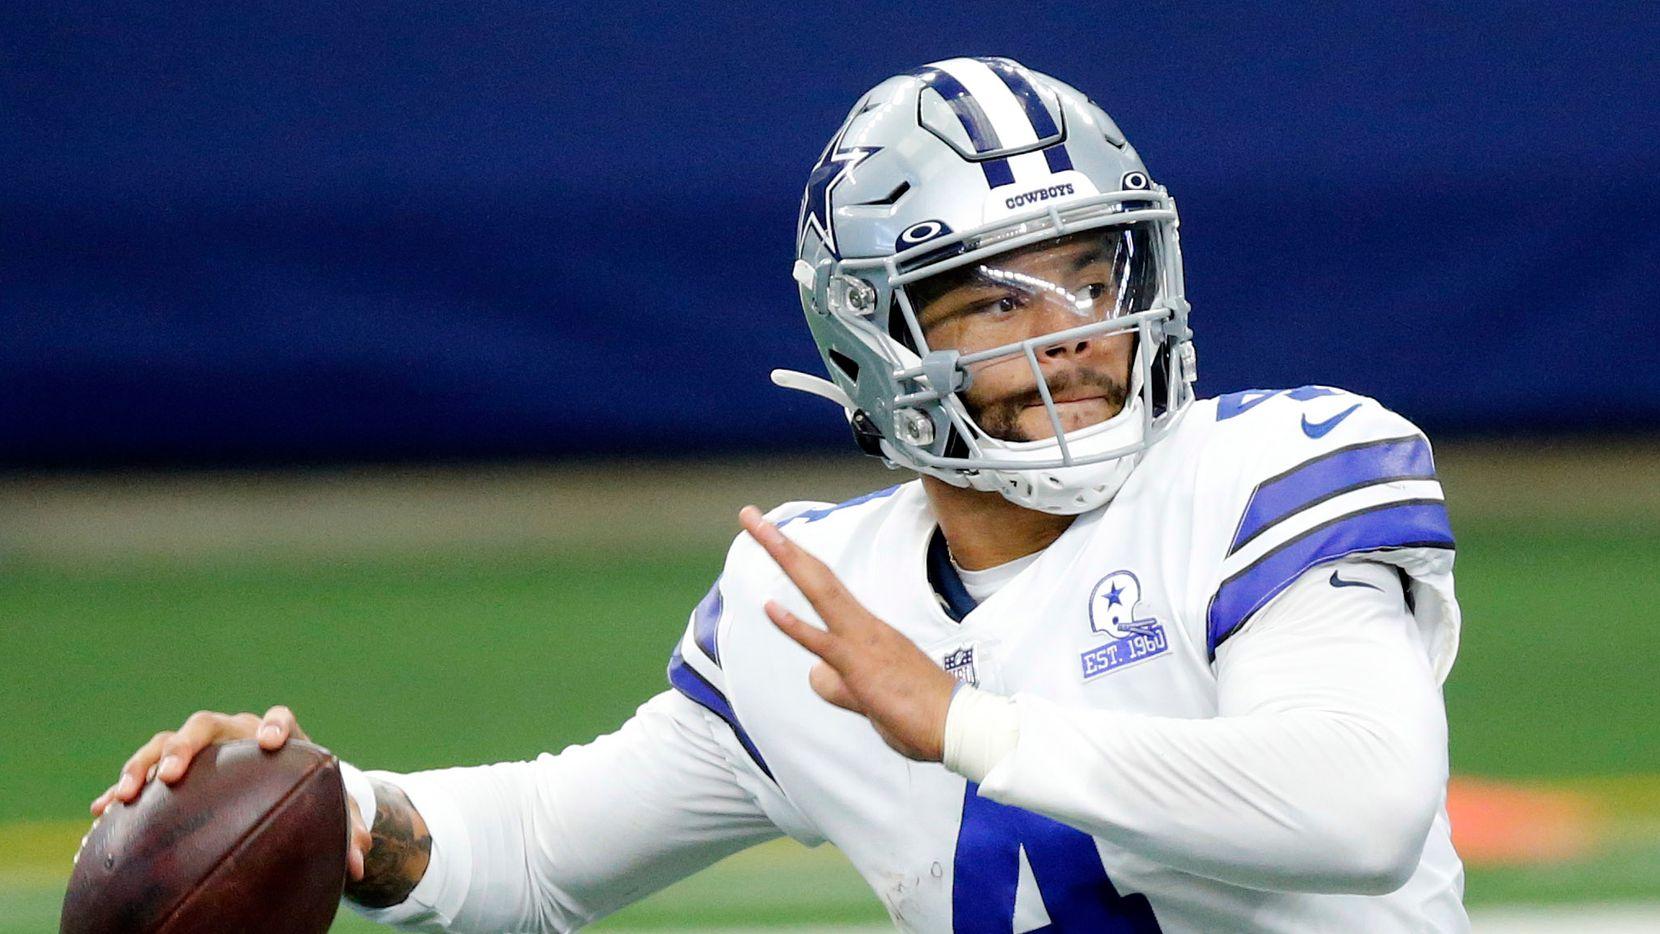 Dallas Cowboys quarterback Dak Prescott (4) throws a fourth quarter pass against the Cleveland Browns at AT&T Stadium in Arlington, Texas, Sunday, October 4, 2020.